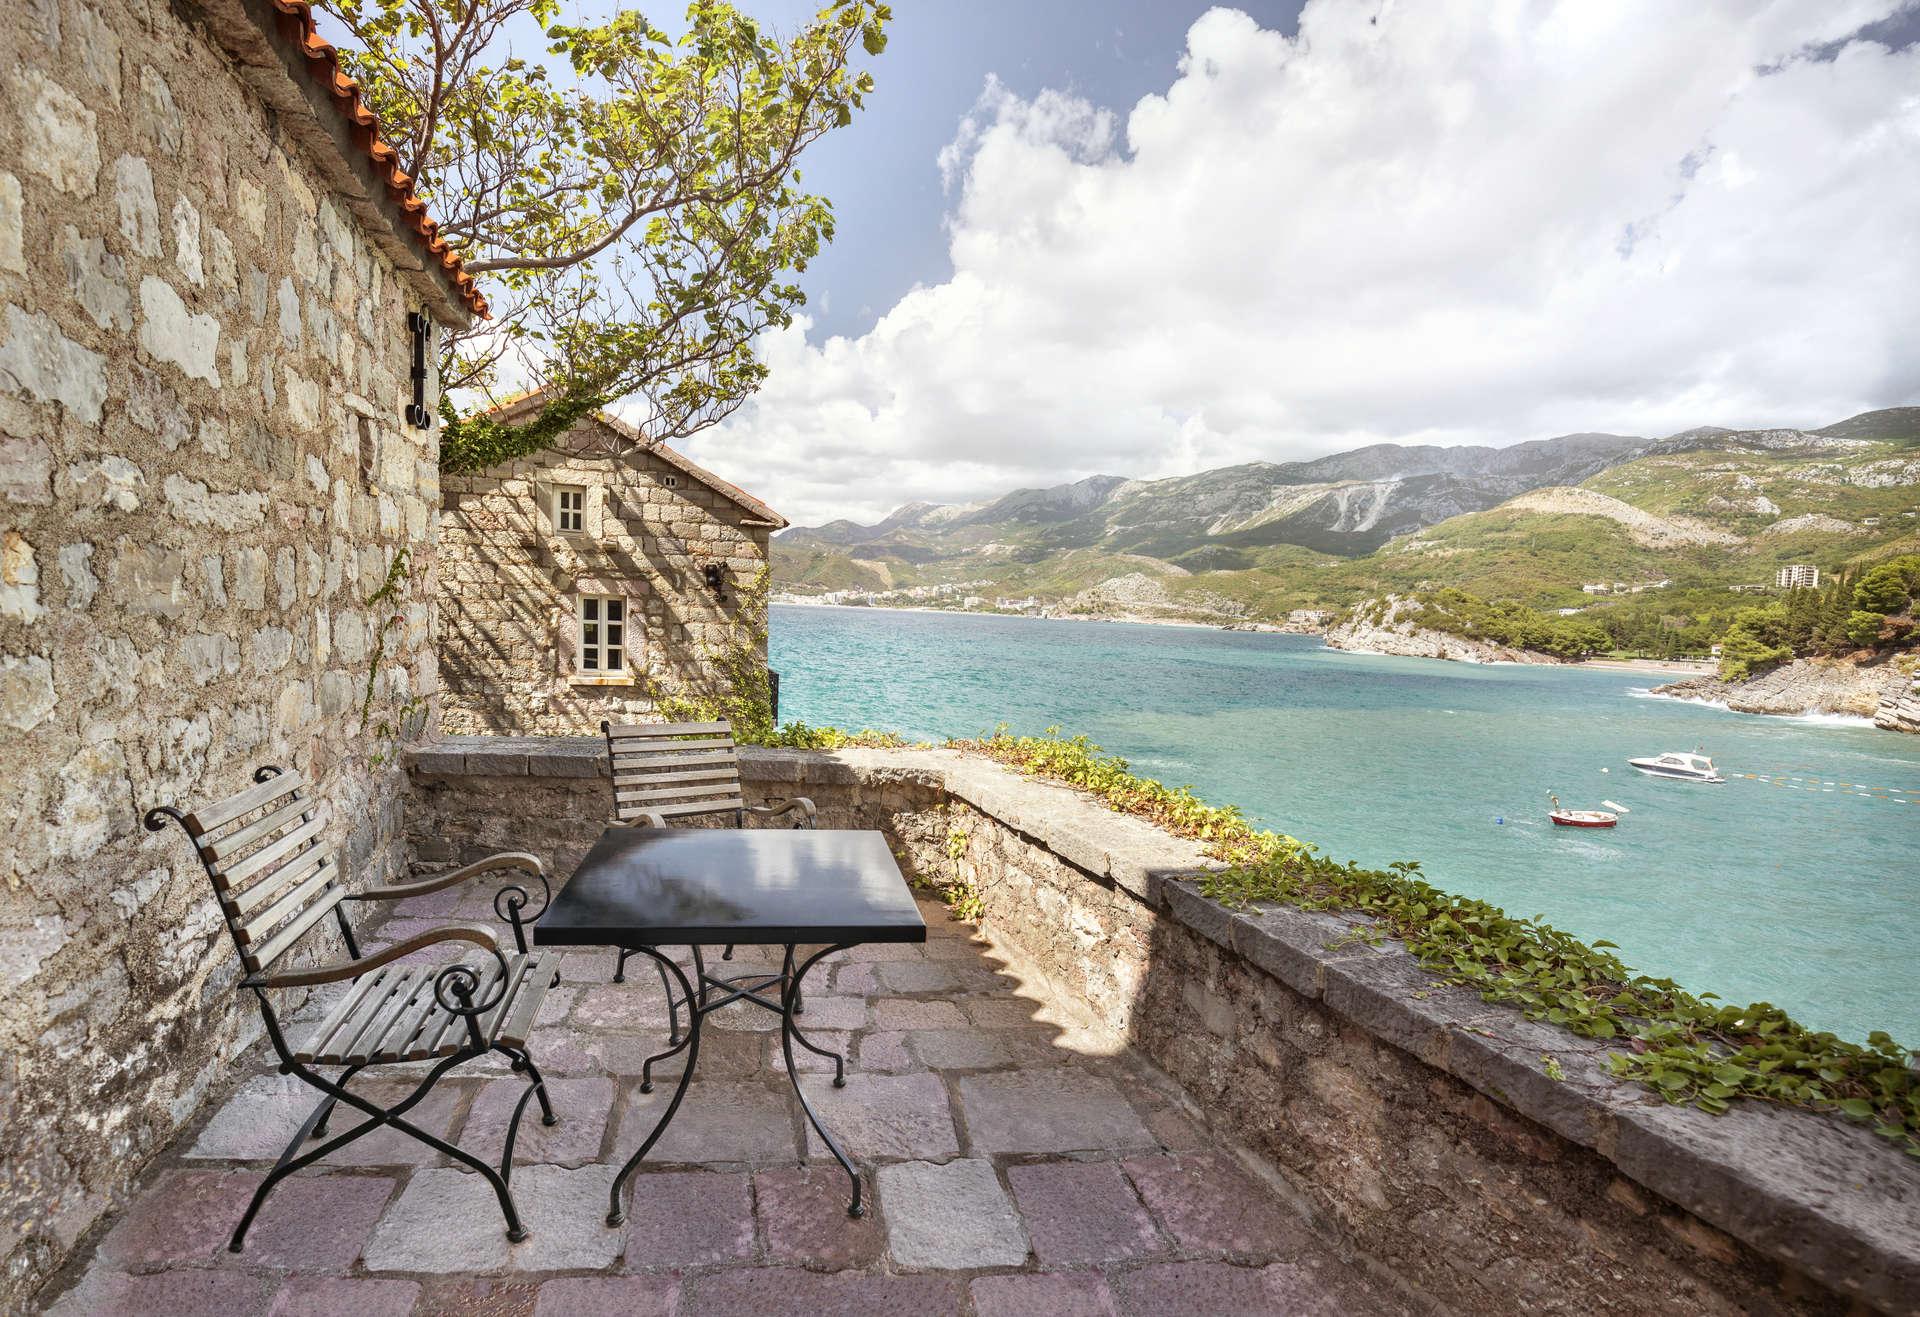 Luxury vacation rentals europe - Montenegro - Aman sveti stefan - No location 4 - Deluxe Cottage | 2 Bedrooms - Image 1/10